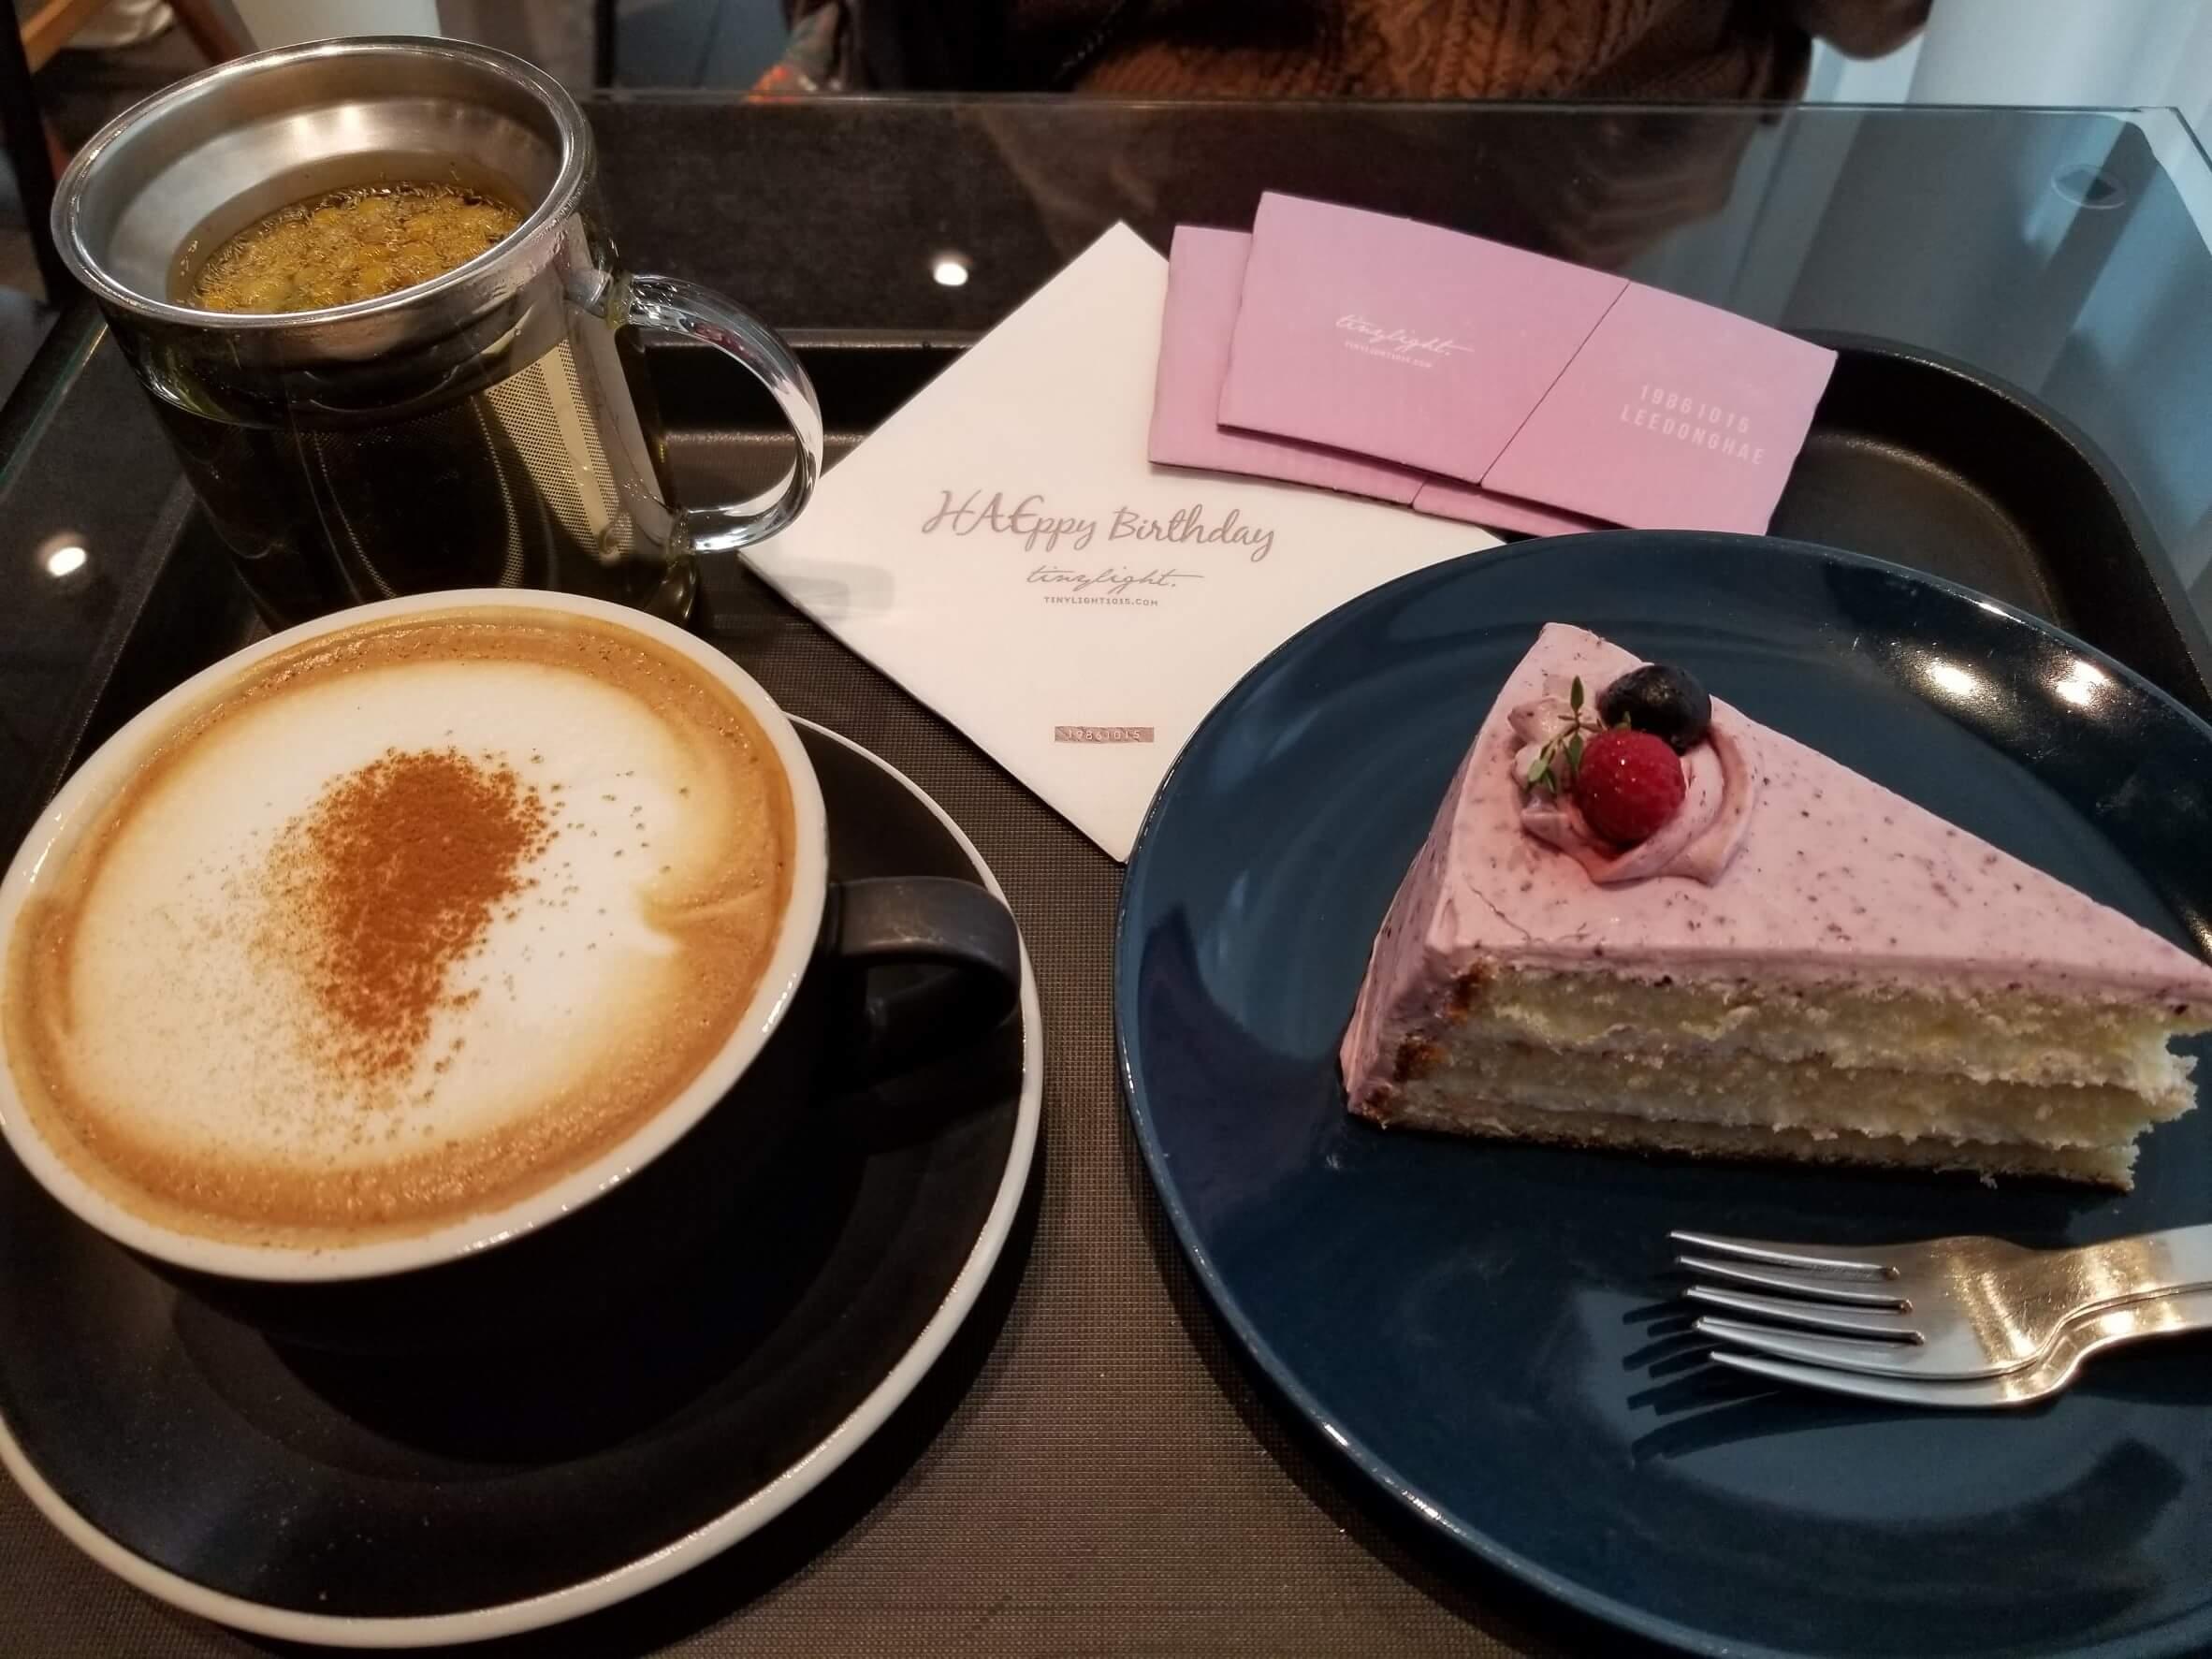 Haru&Oneday:ドンヘ誕生日(センイル)おめでとう会